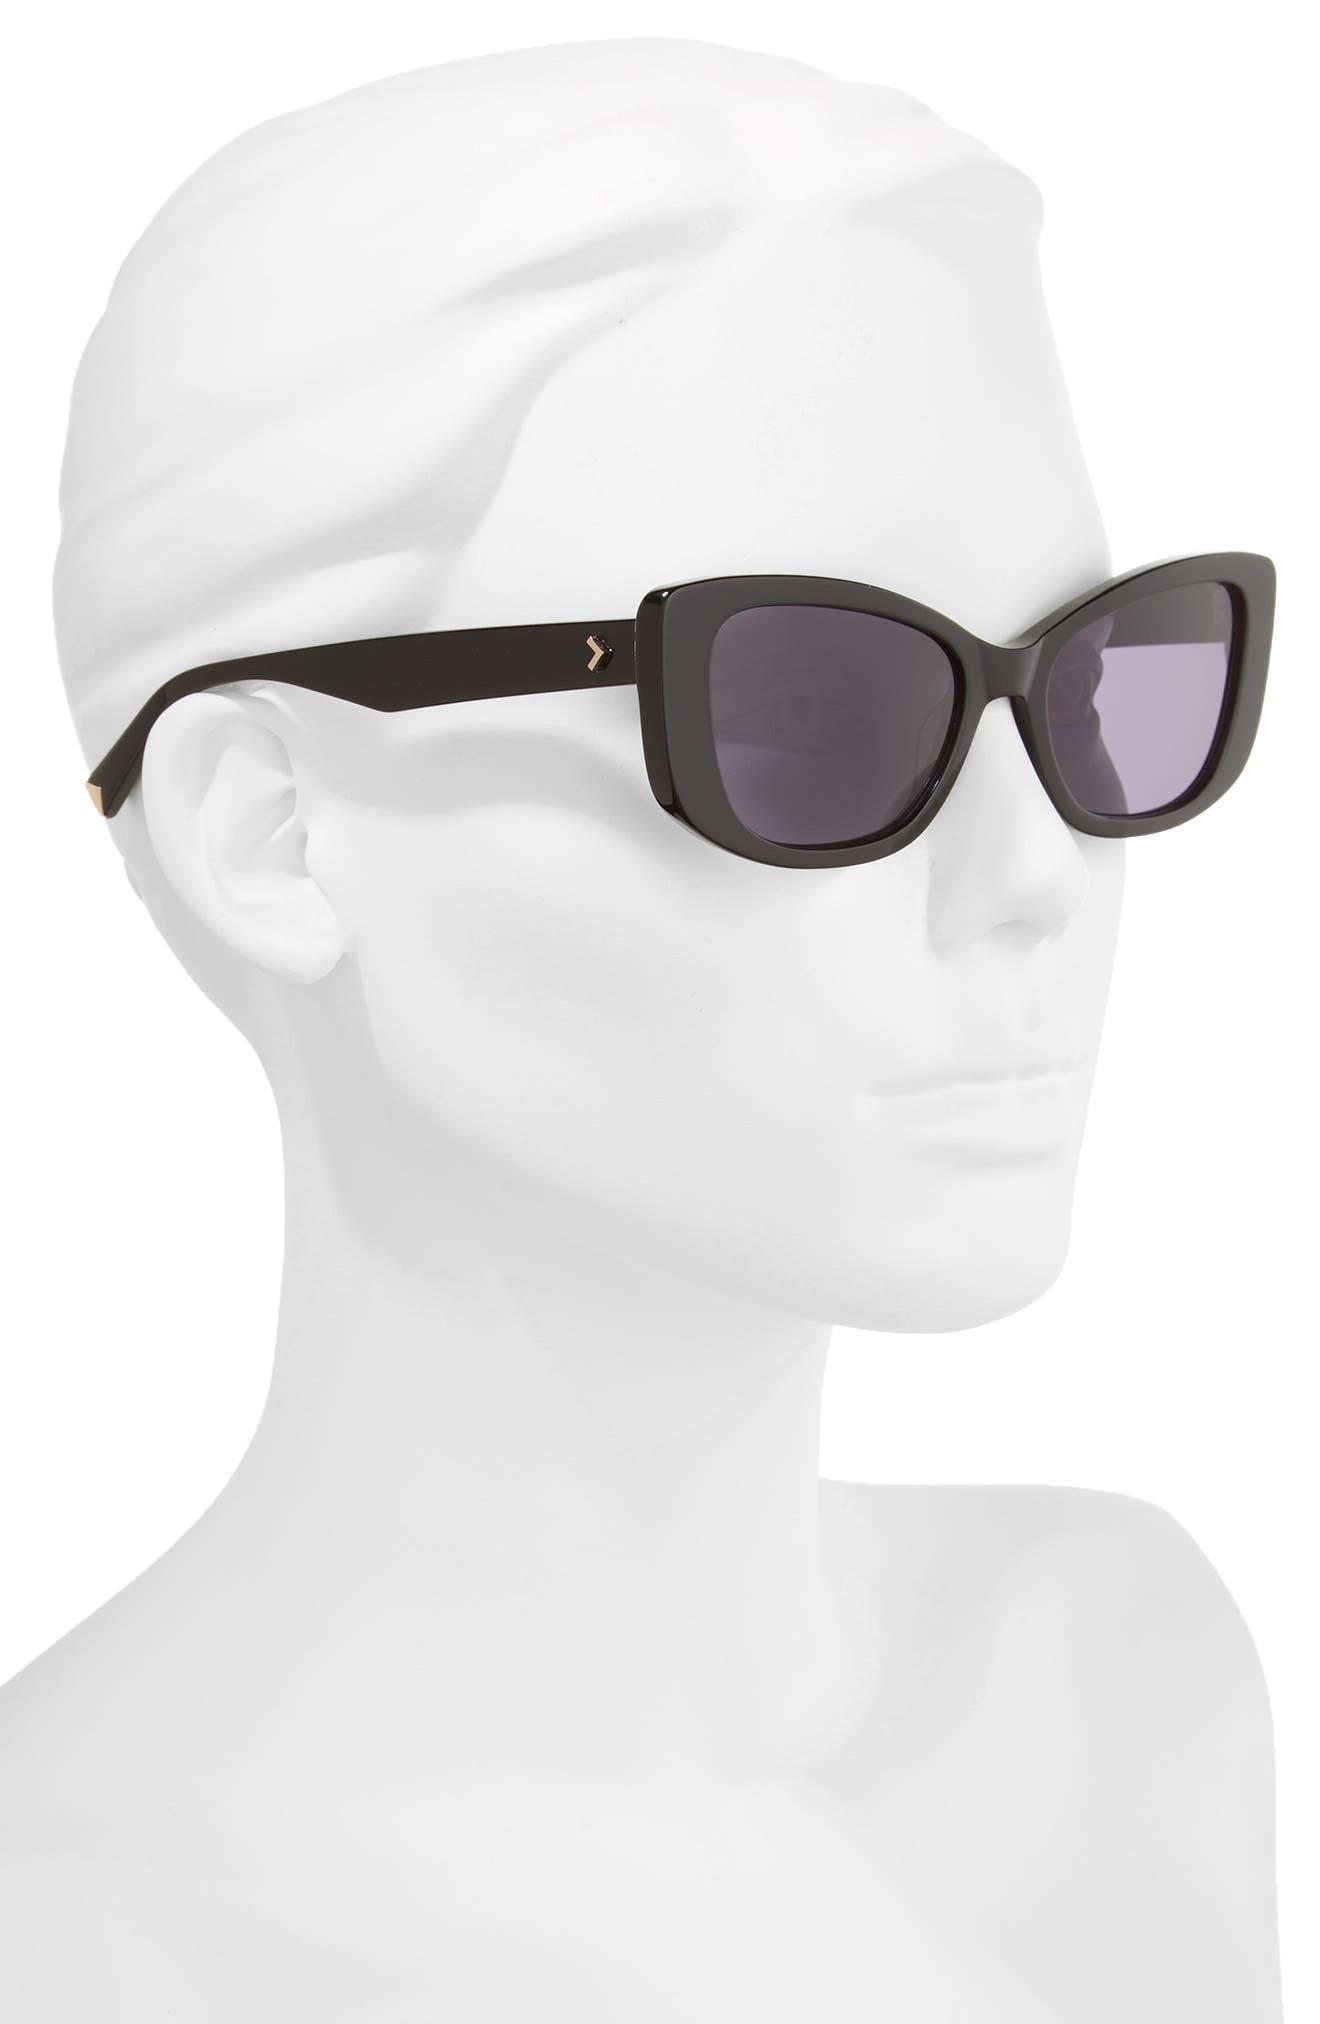 53mm Cat Eye Sunglasses,                             Alternate thumbnail 2, color,                             001